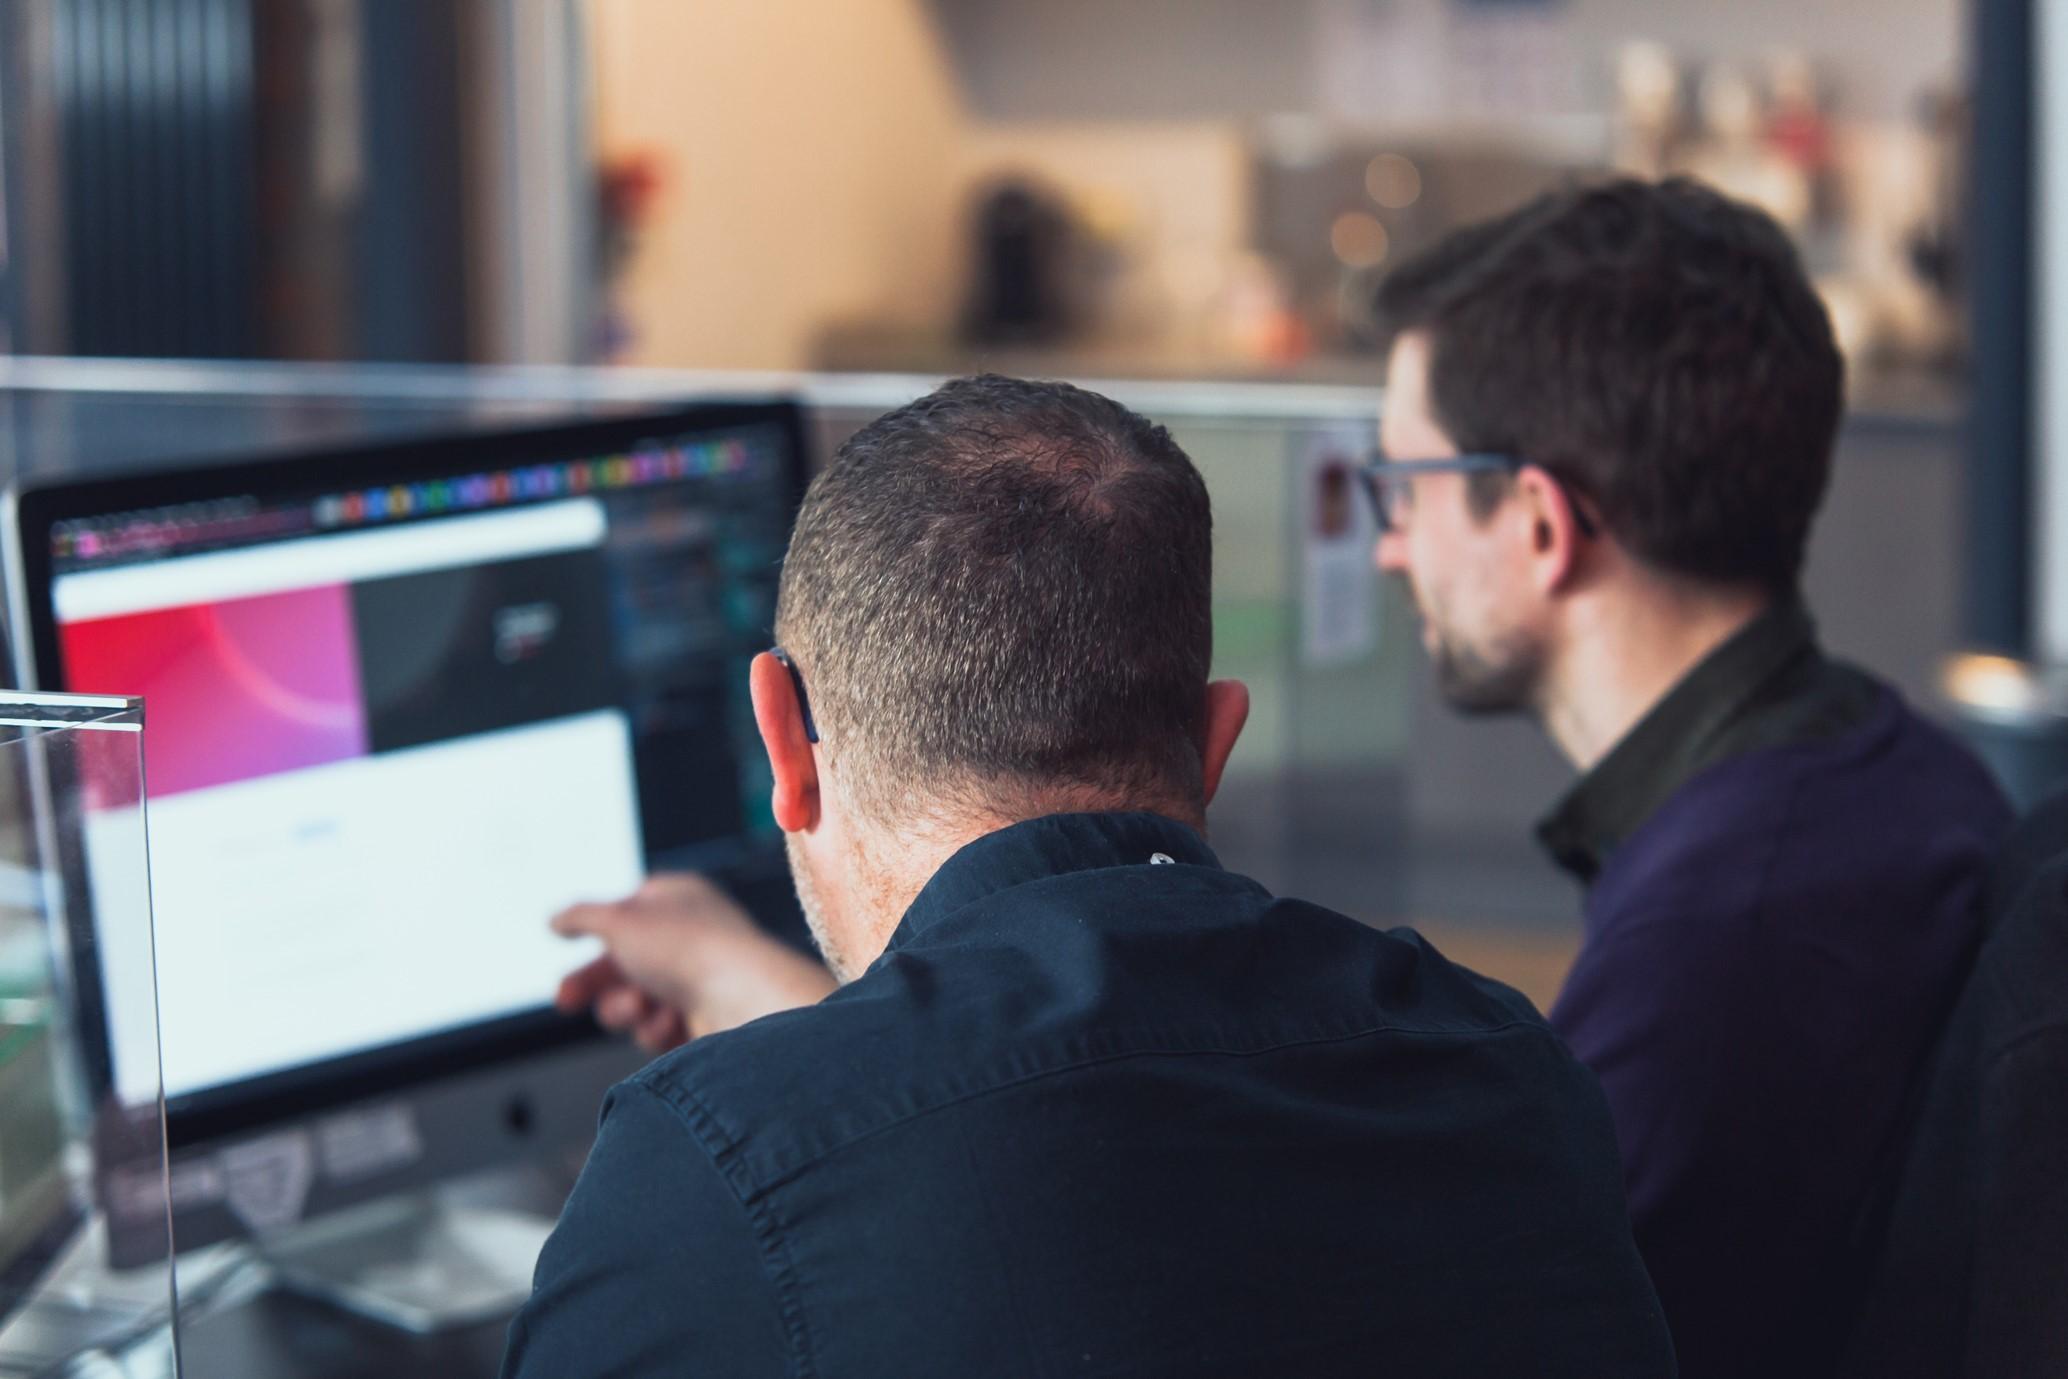 Matt Isherwood & Richard Calise discussing a digital project